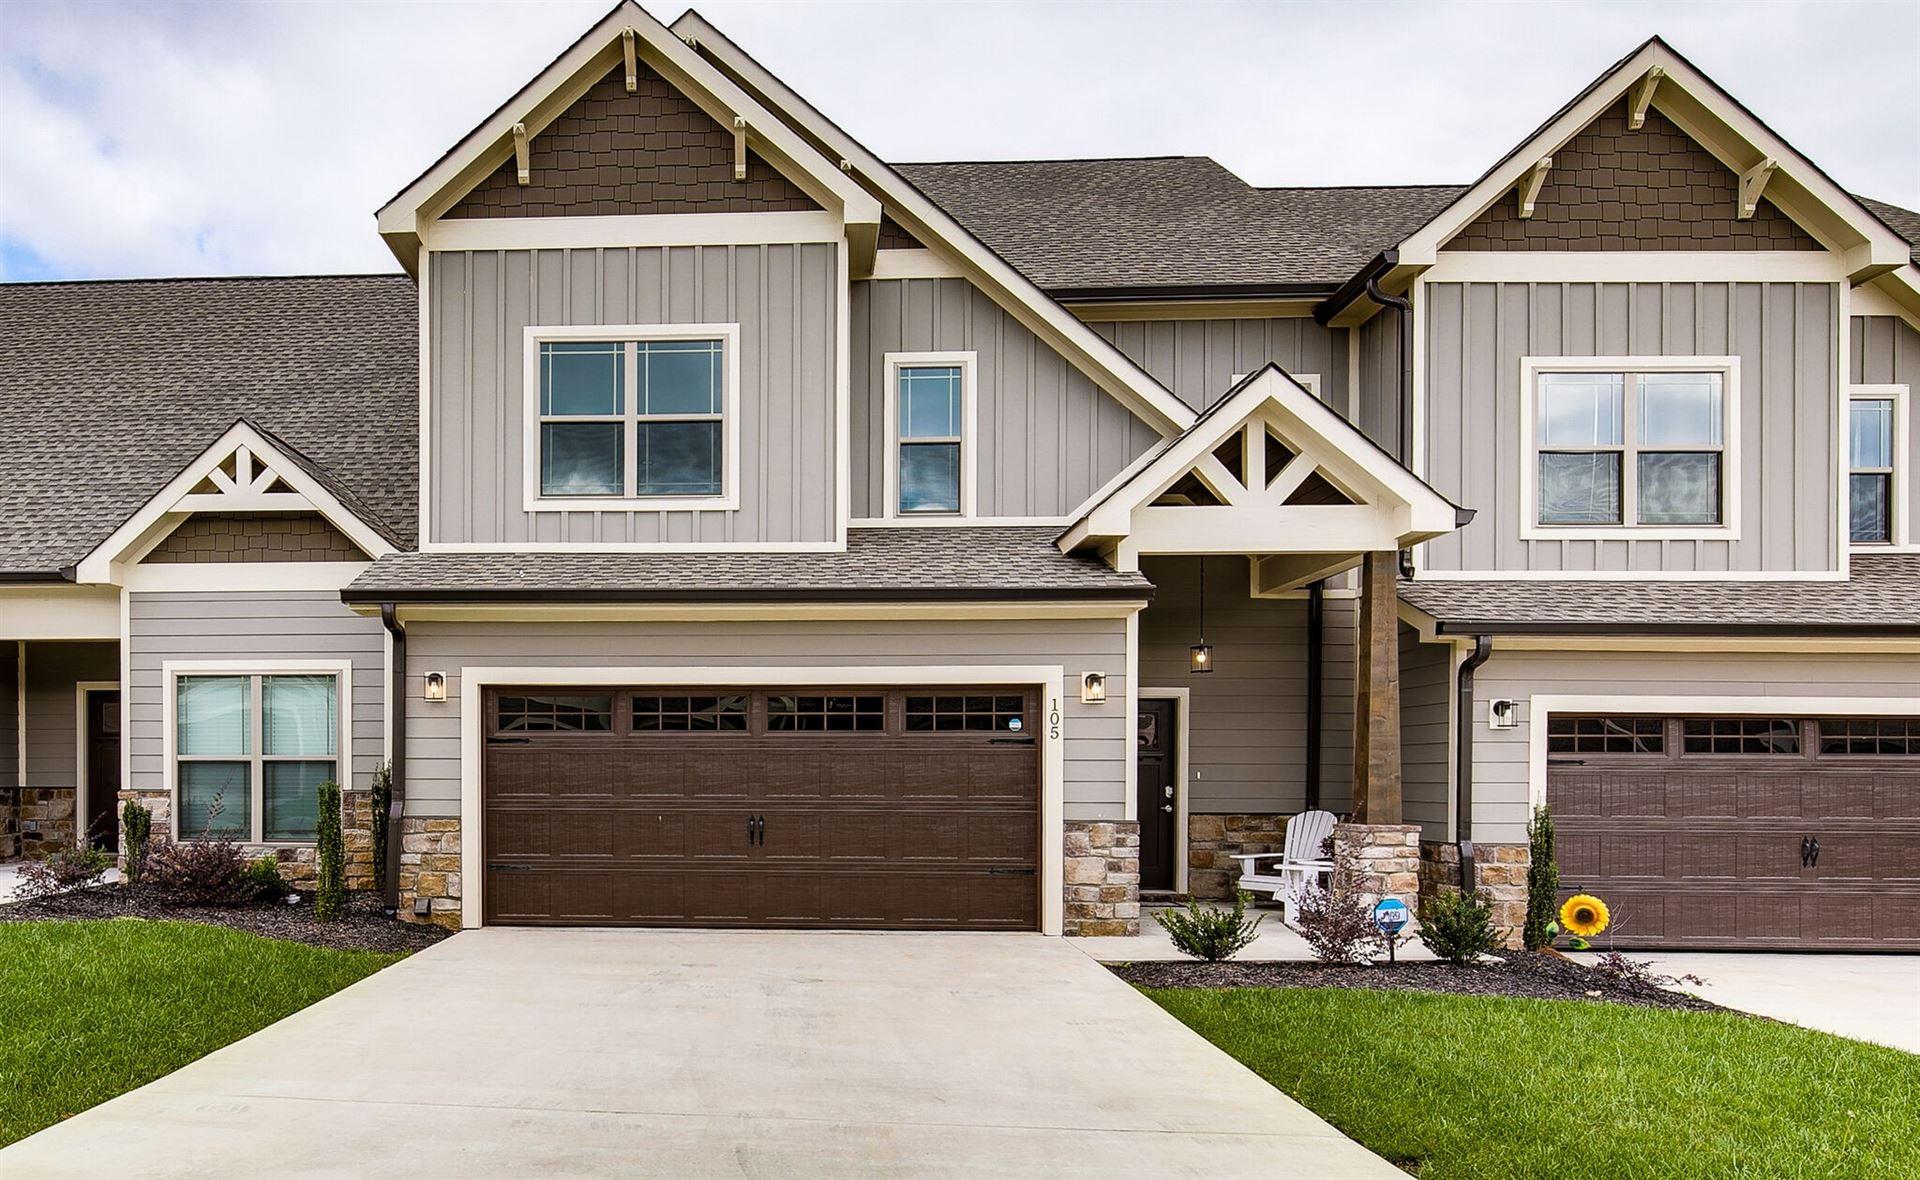 105 Island Way, Winchester, TN 37398 - MLS#: 2203268